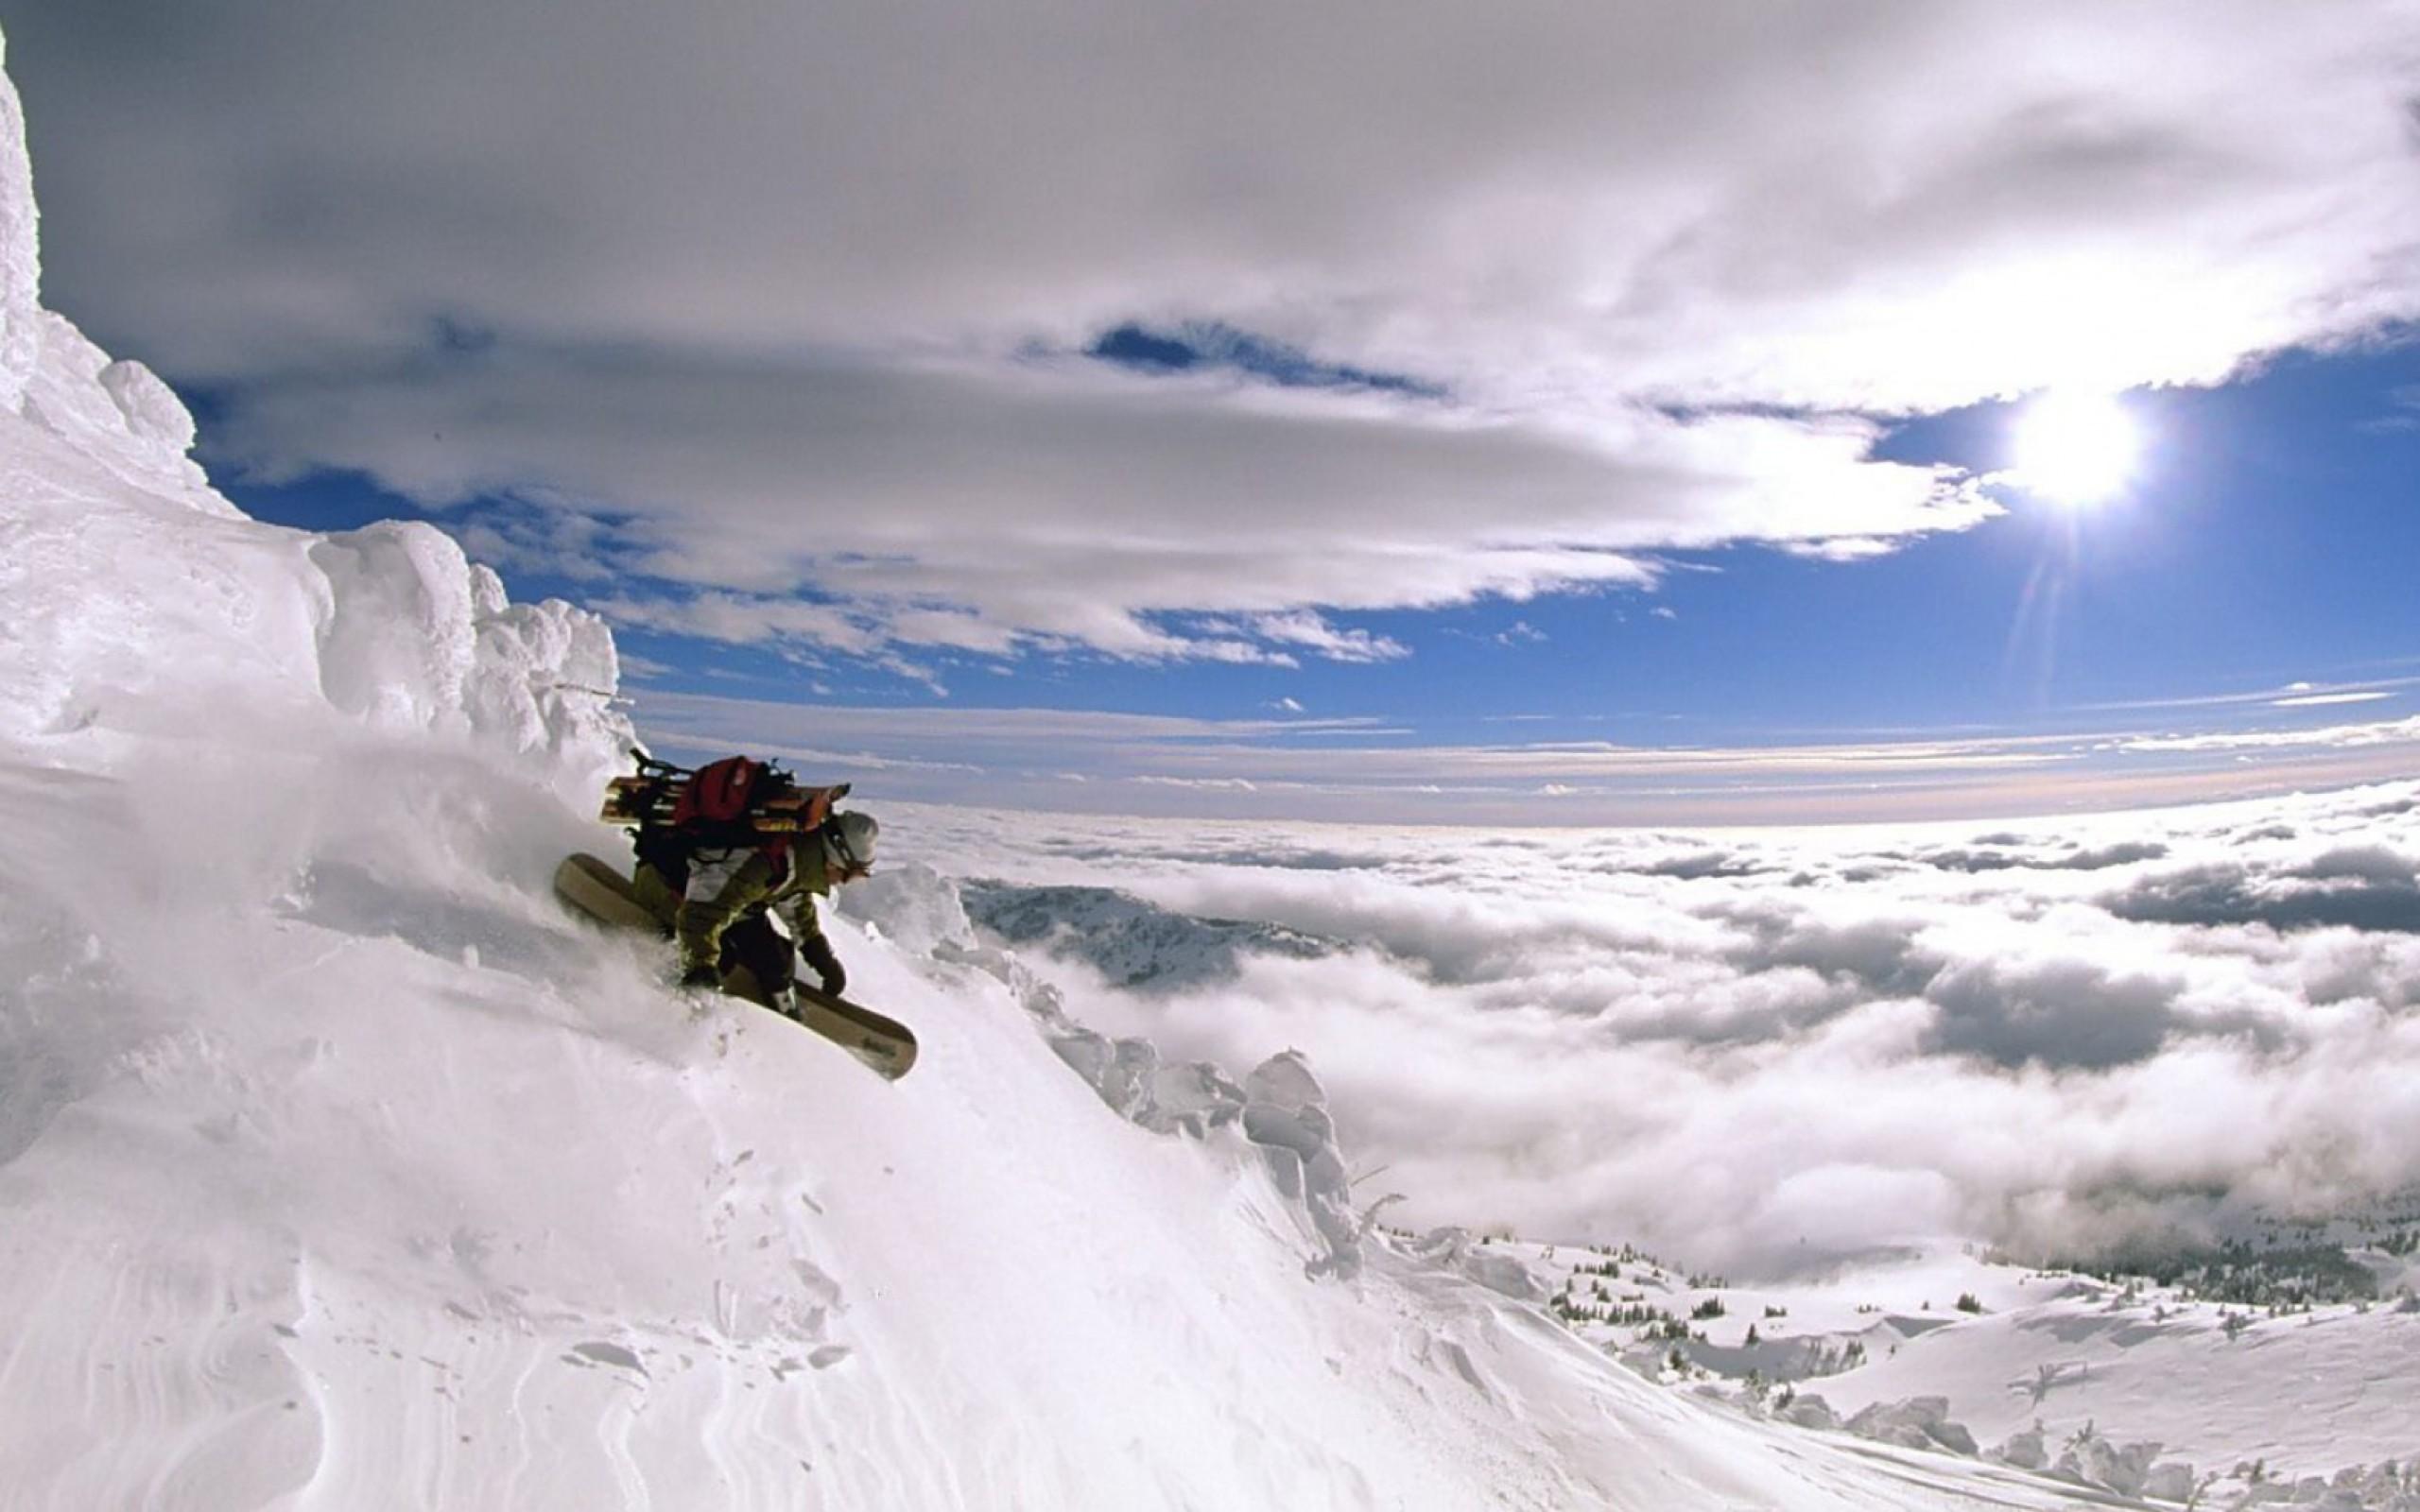 Snowboarding On Top Of The World Hd Wallpaper 13 Retina Macbook Pro Hd Wallpaper Wallpapers Net